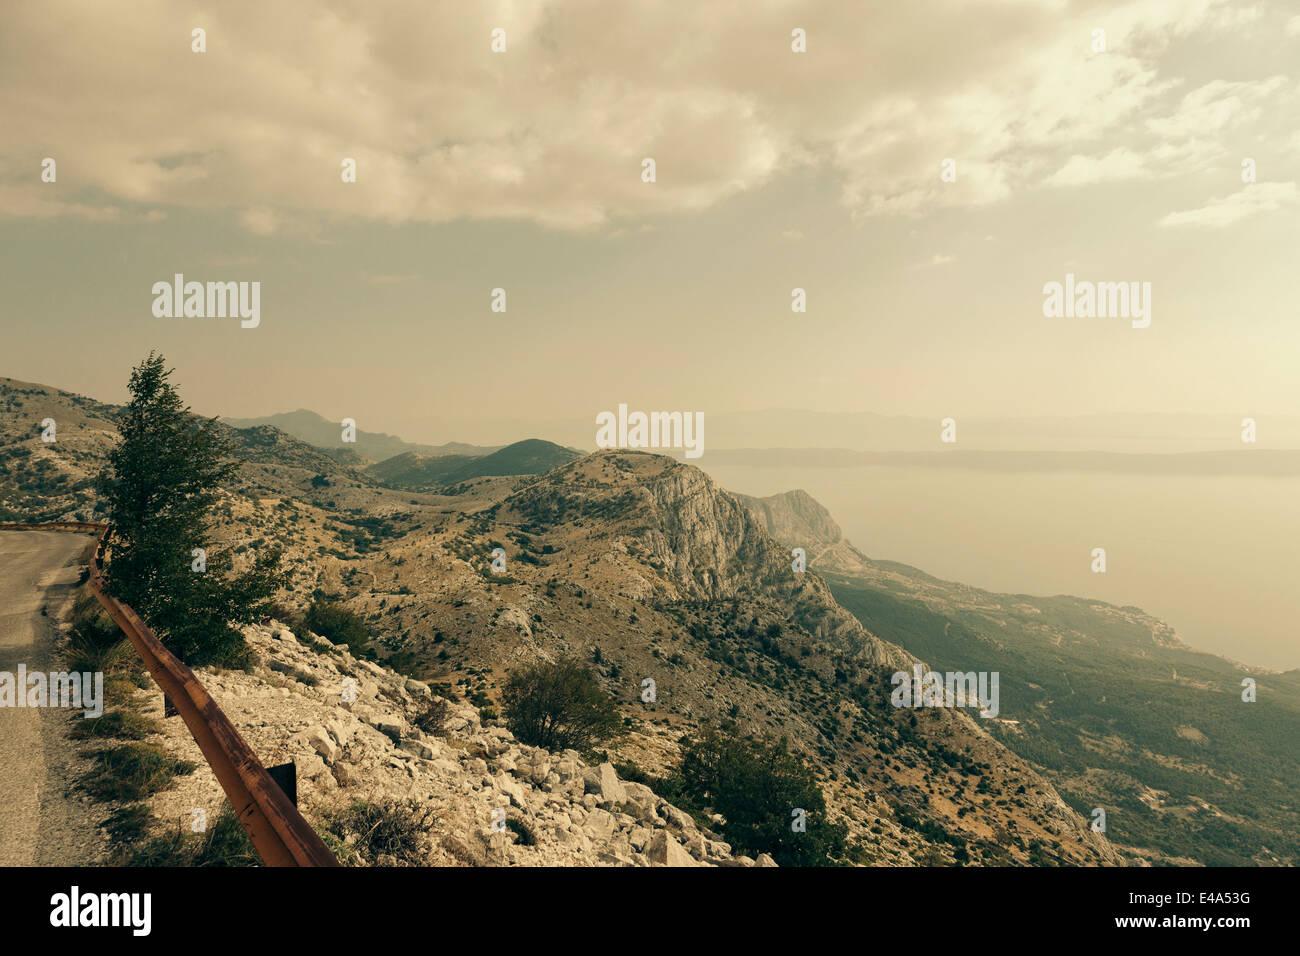 Croatia, Dalmatia, Biokovo, View from Sveti Jure - Stock Image